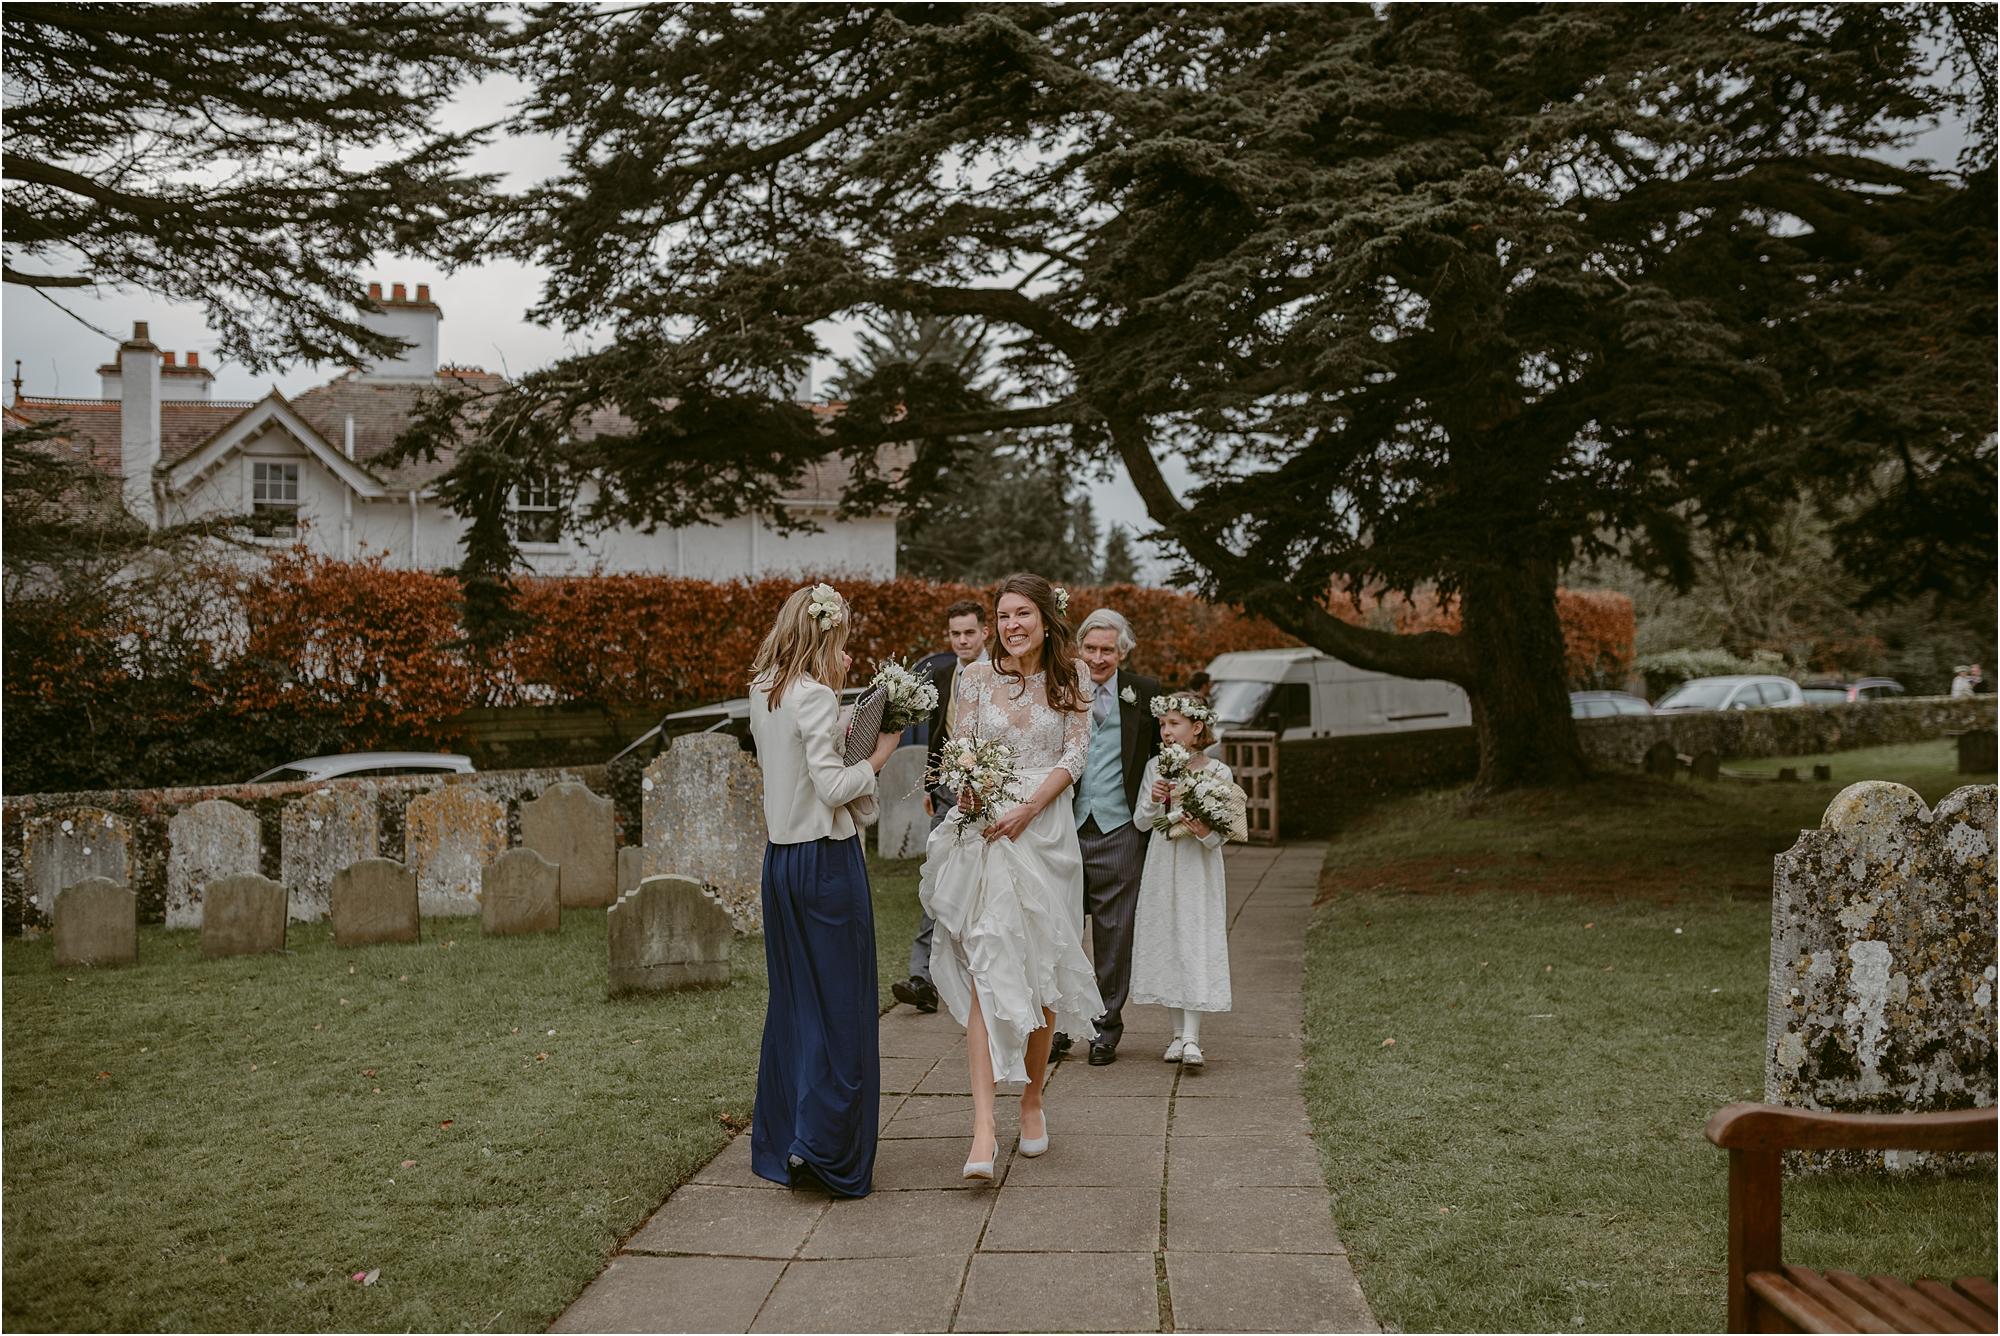 Rose+Harry-outdoor-english-wedding-photography__0047.jpg